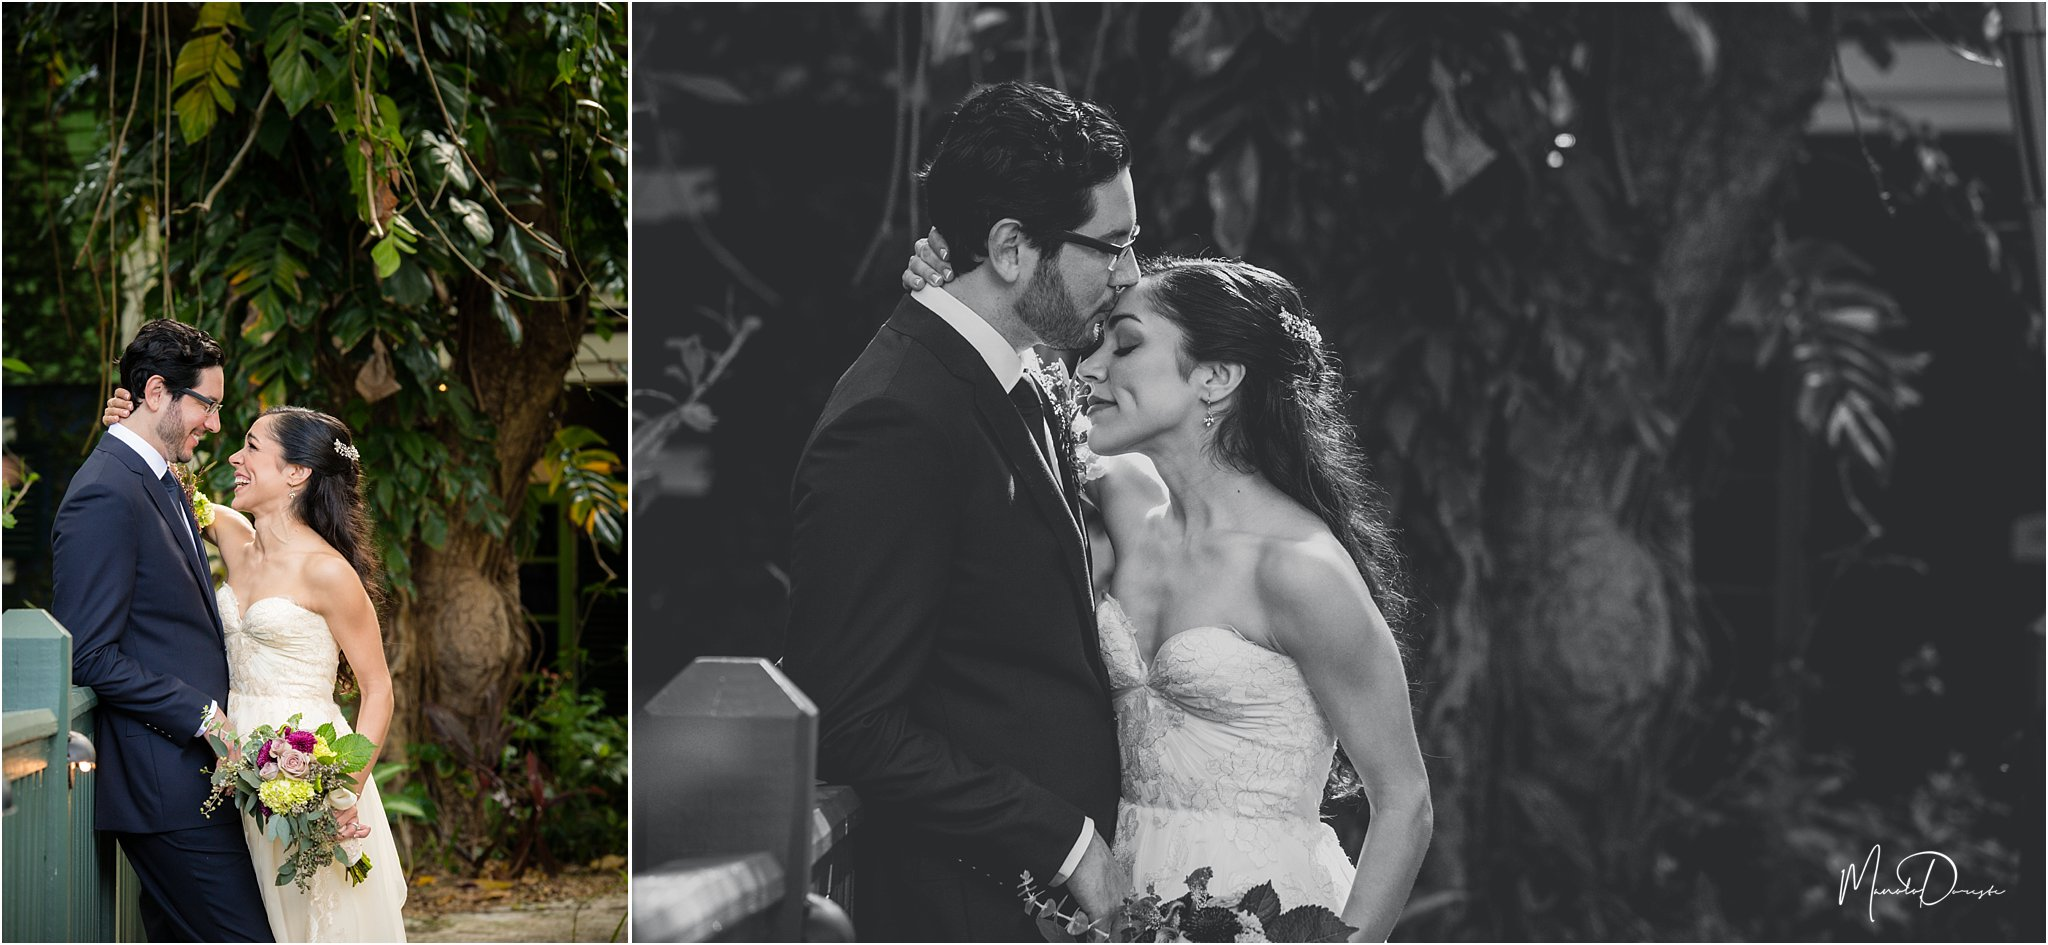 0511_ManoloDoreste_InFocusStudios_Wedding_Family_Photography_Miami_MiamiPhotographer.jpg